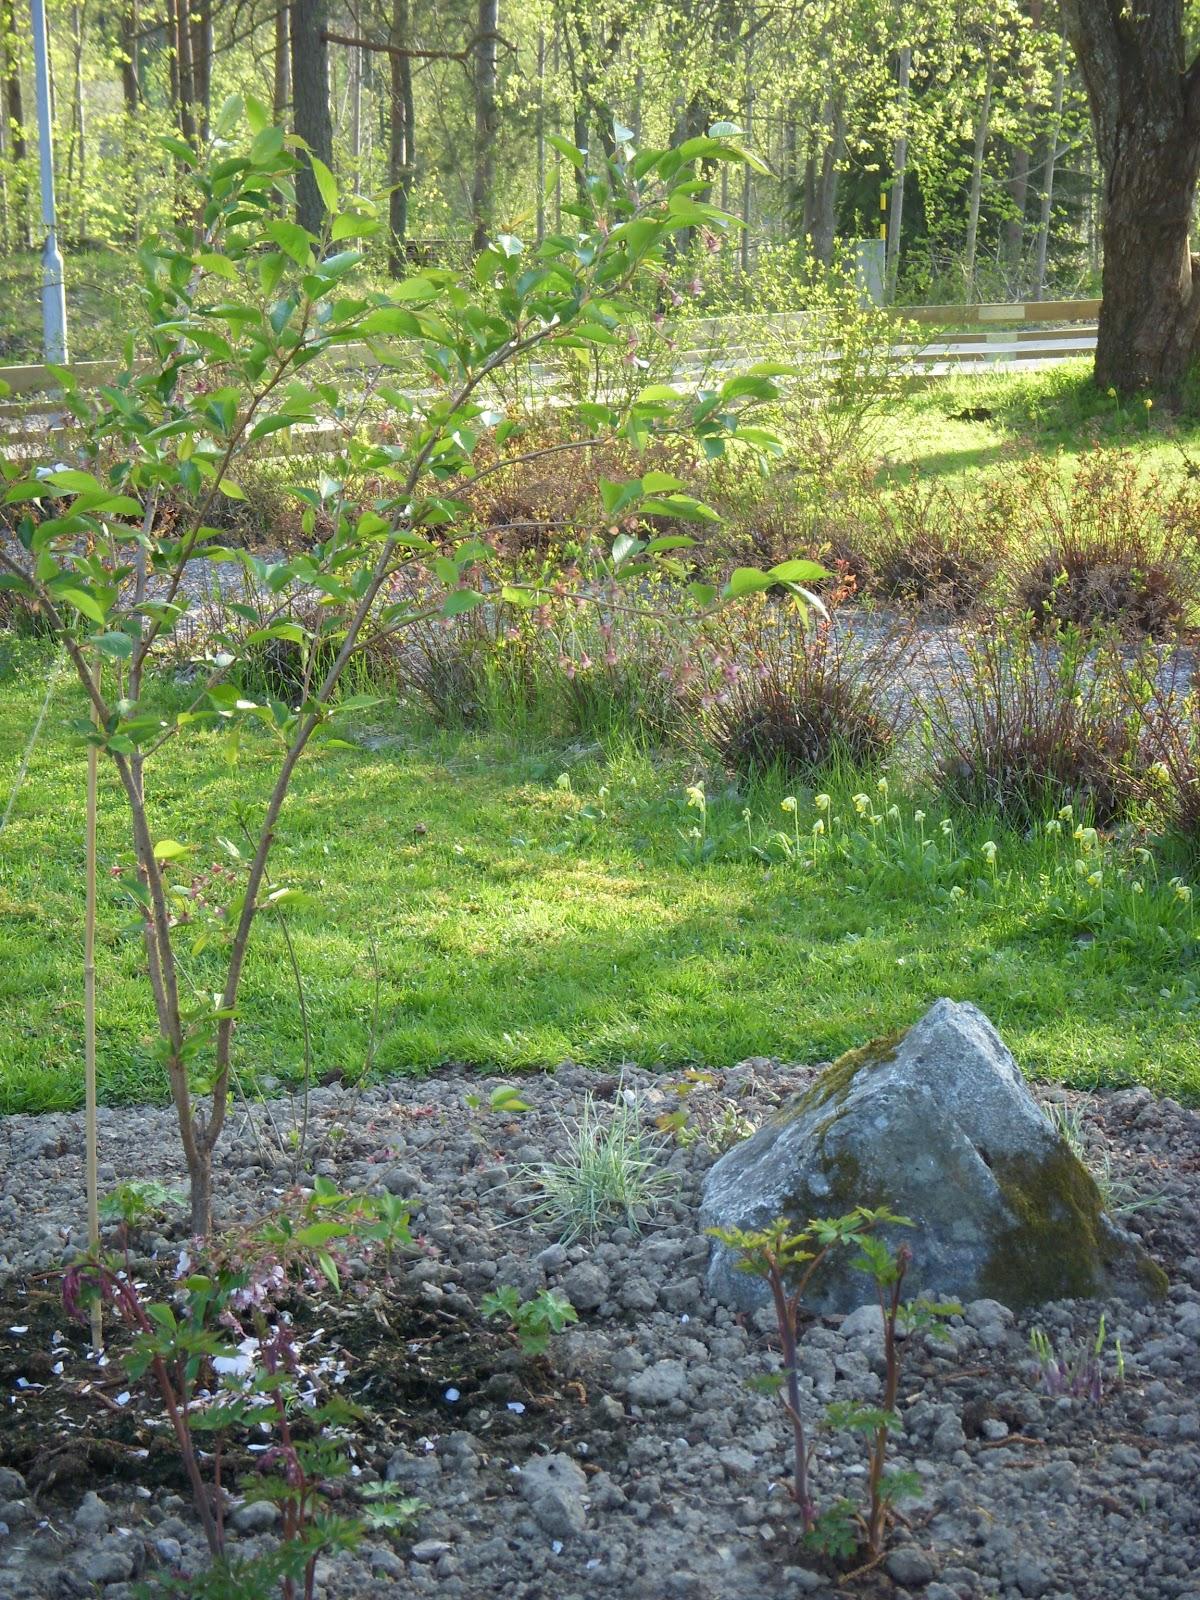 Helena´s hem & trädgård: acchleja träffen hos petra!